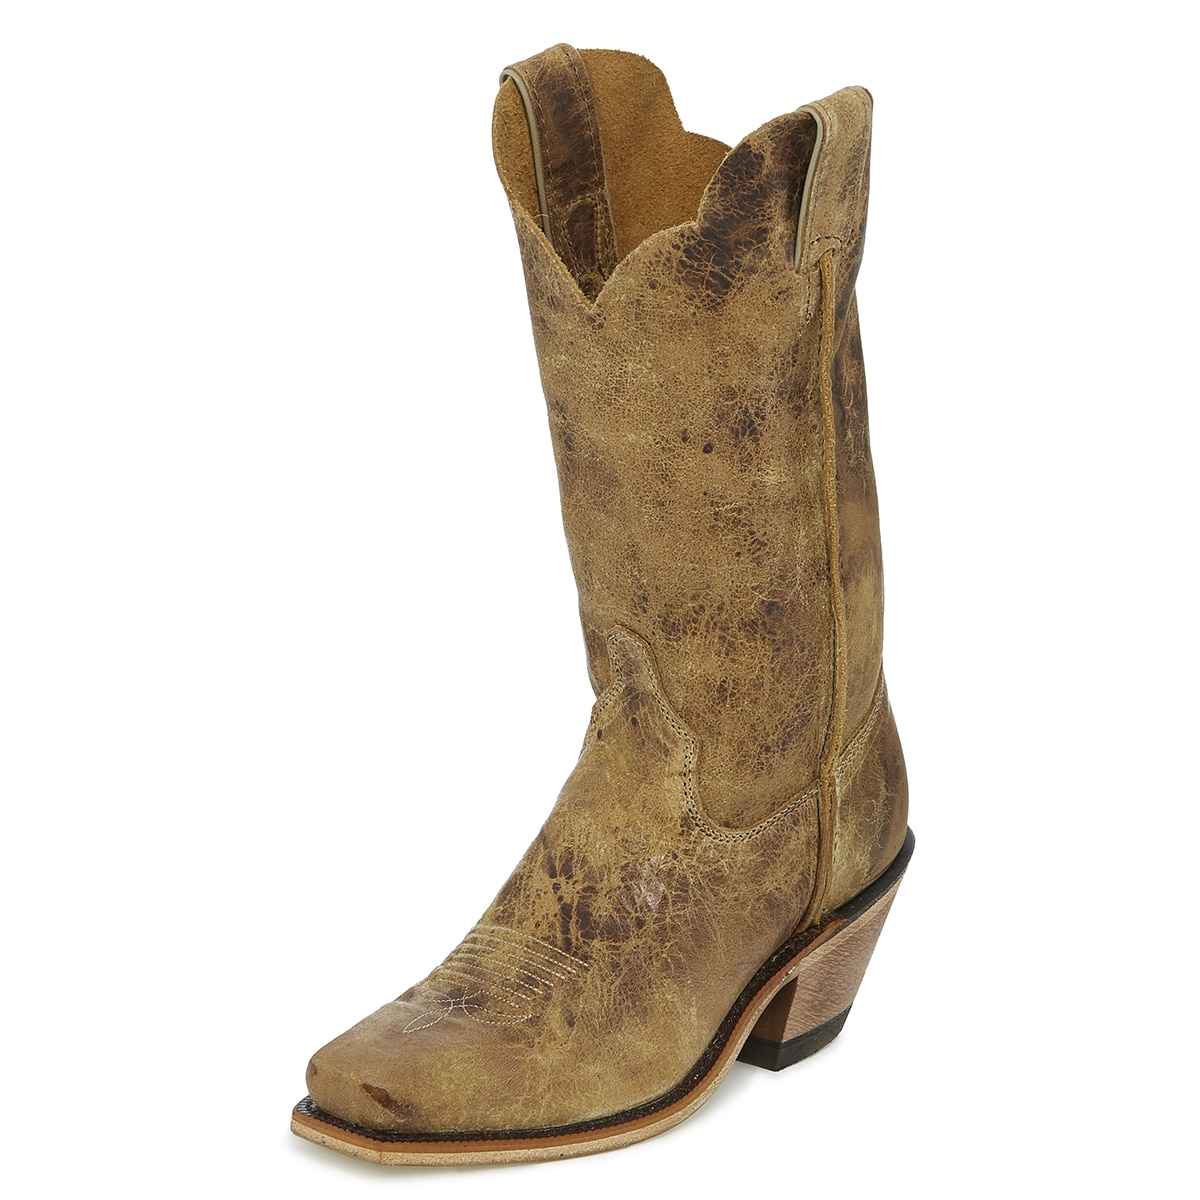 Justin Women's Bent Rail Wildwood Boots - Tan Road